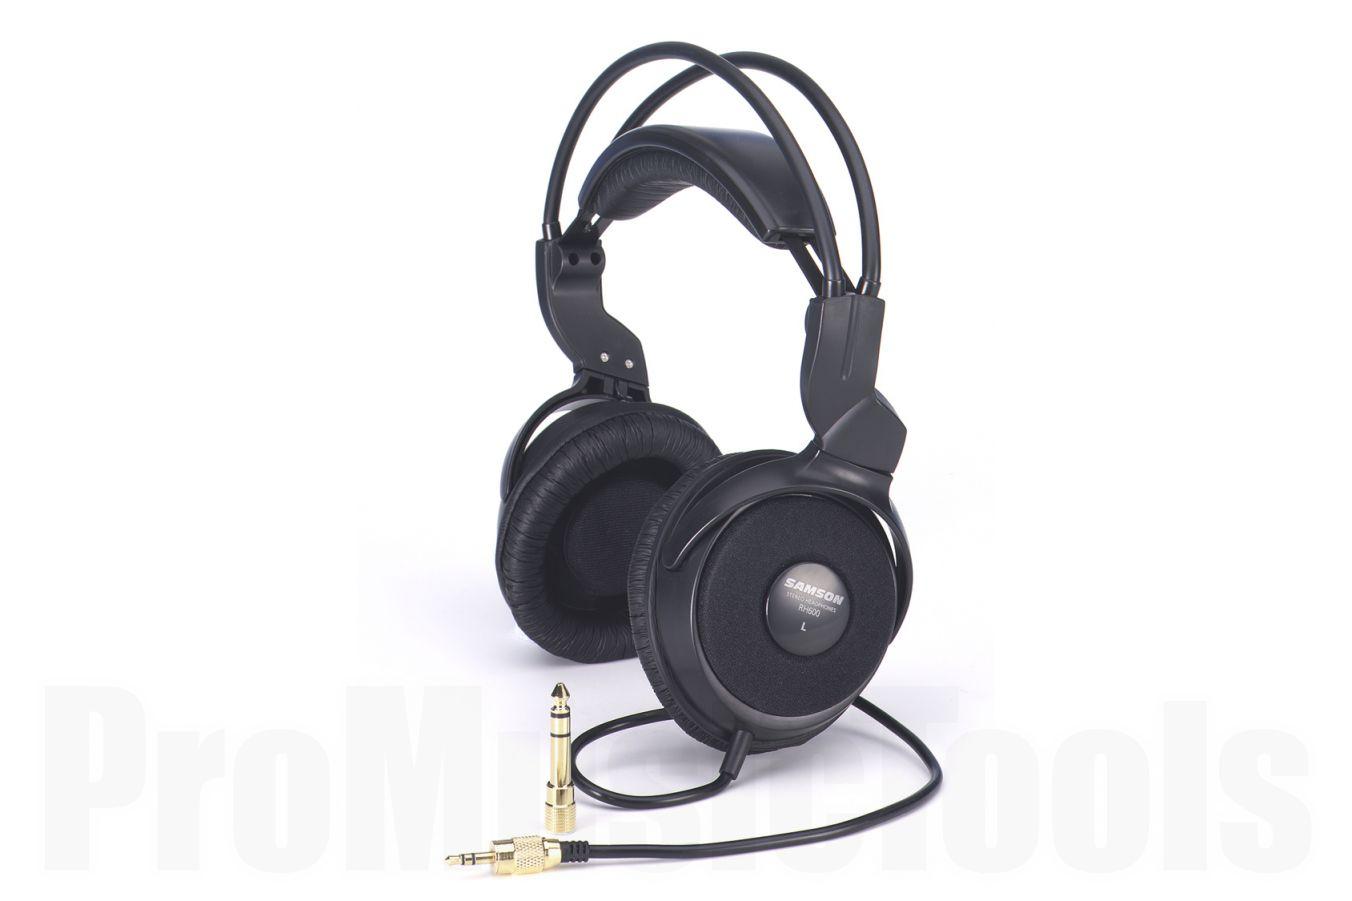 Samson RH600 Studio Reference Headphones